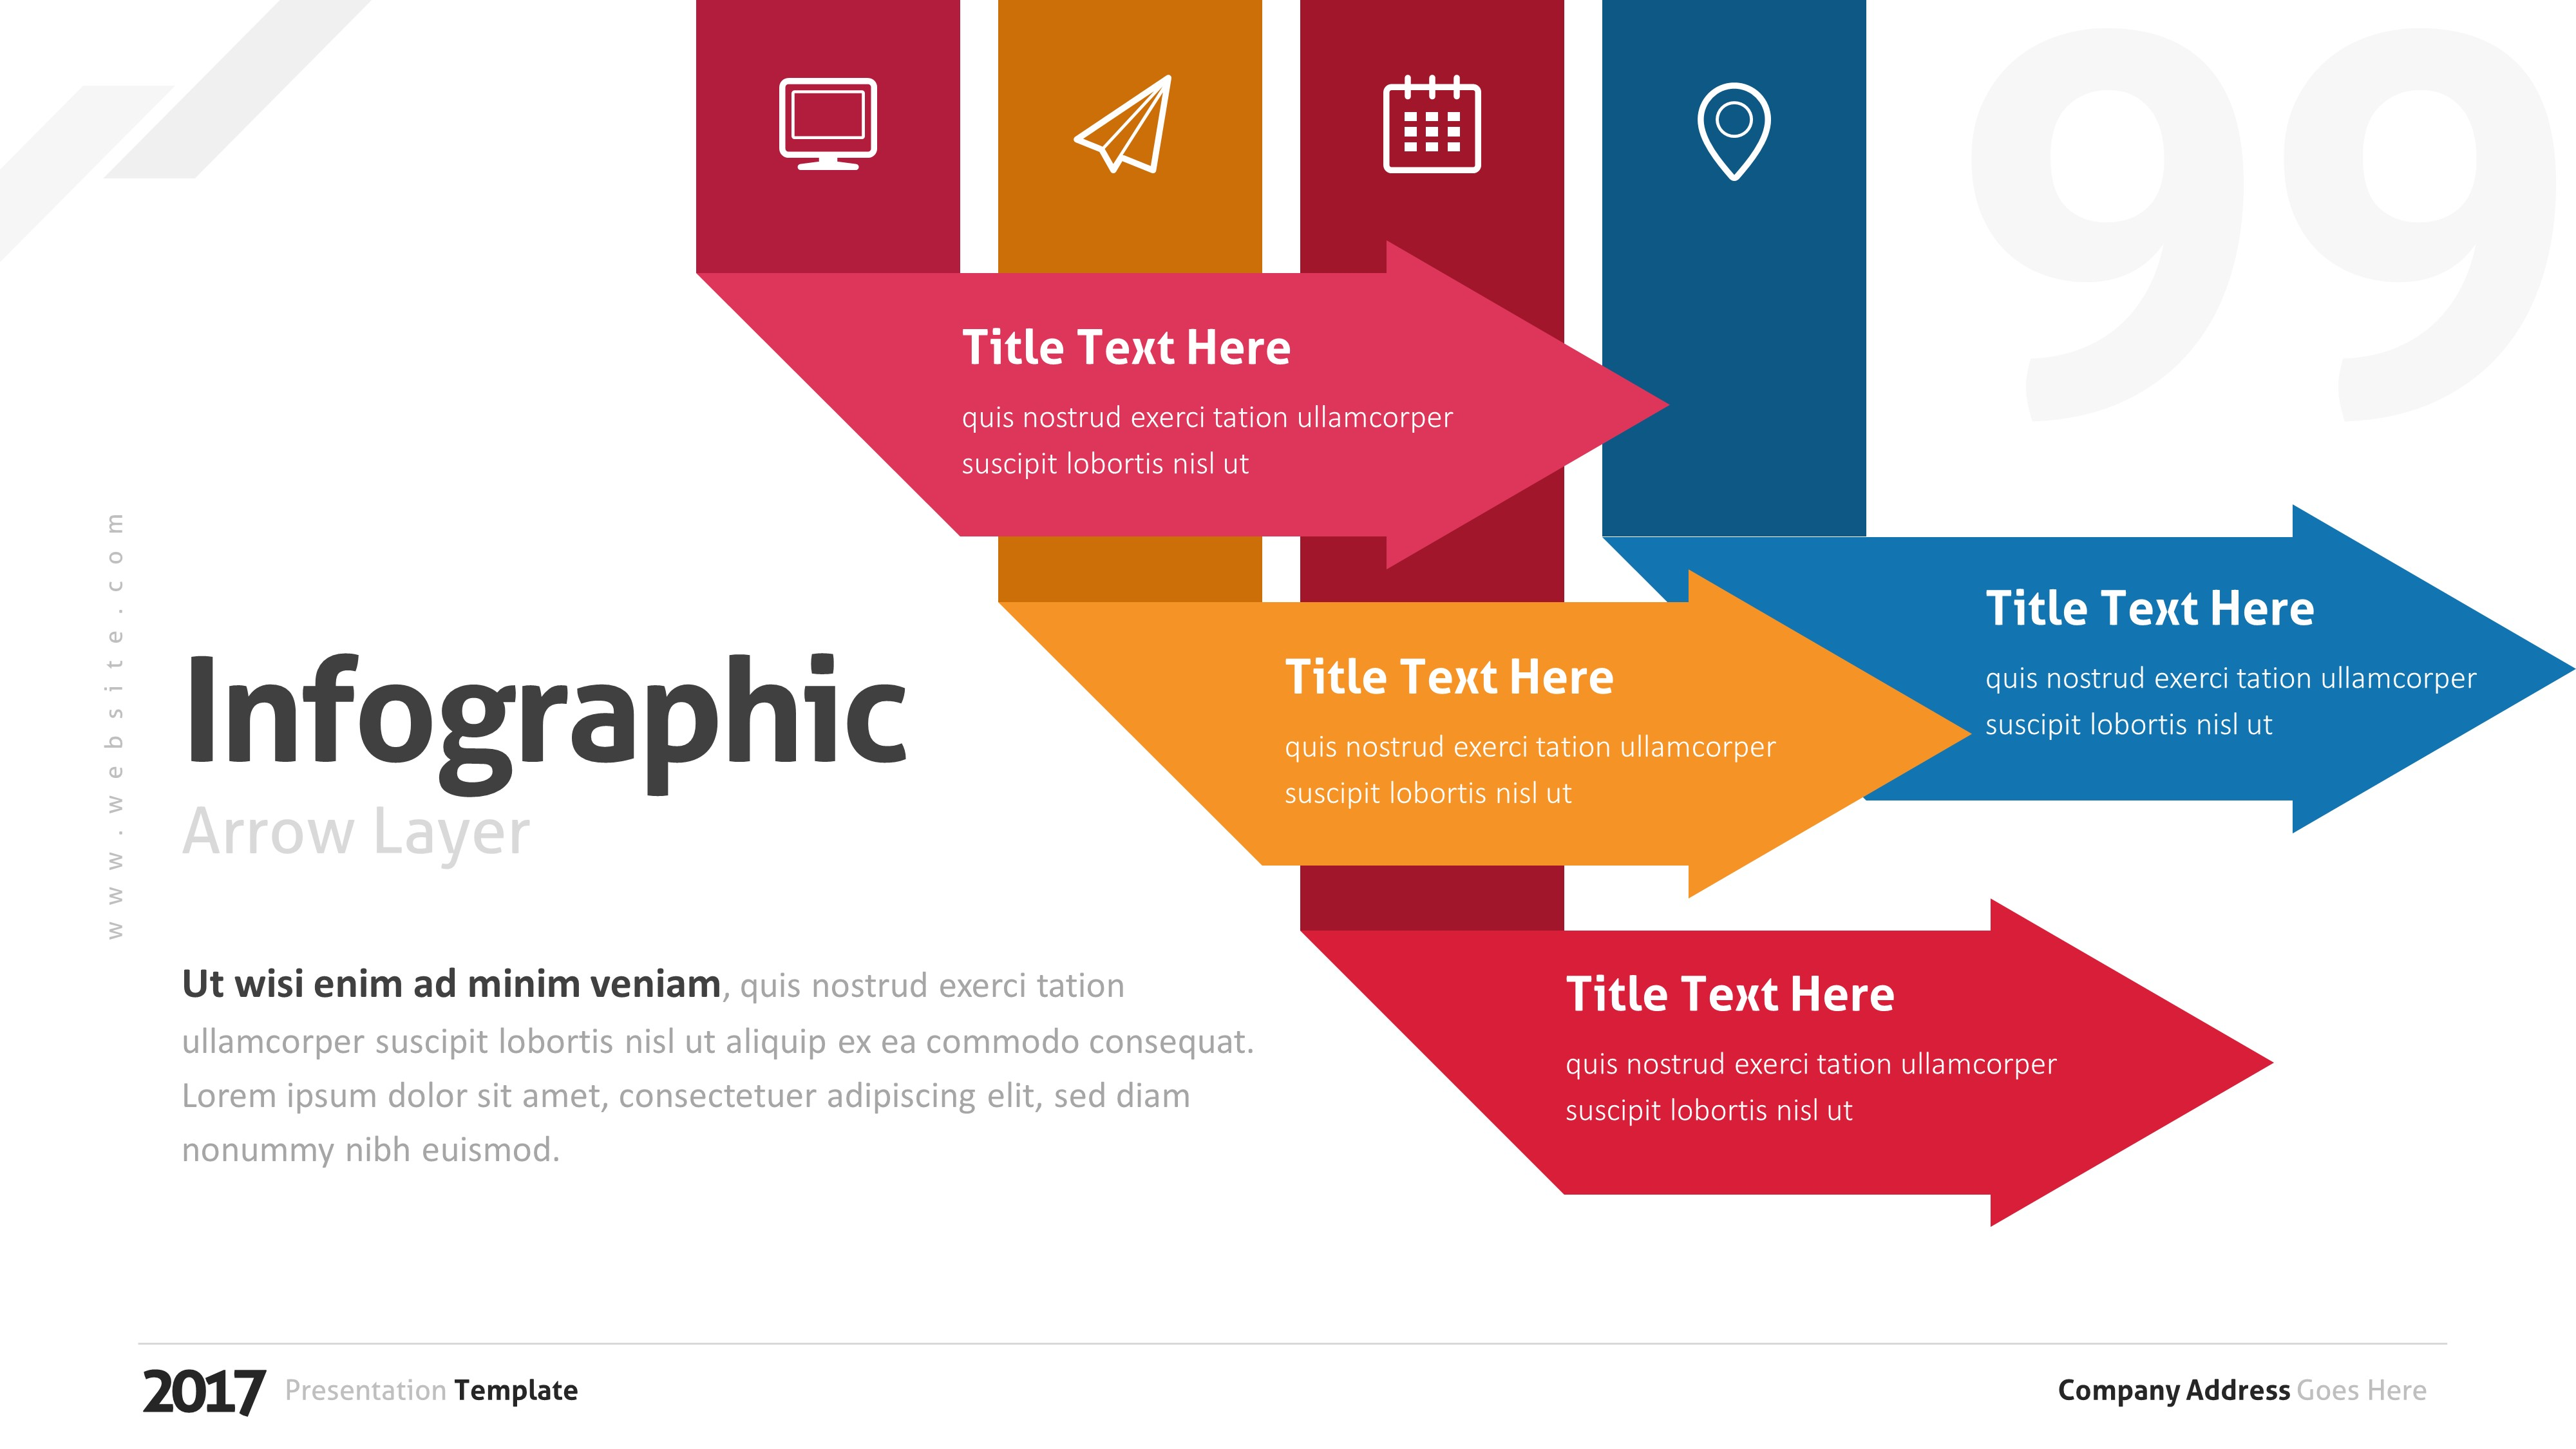 Project Presentation | 2017 Project Presentation Template By Brandearth Graphicriver